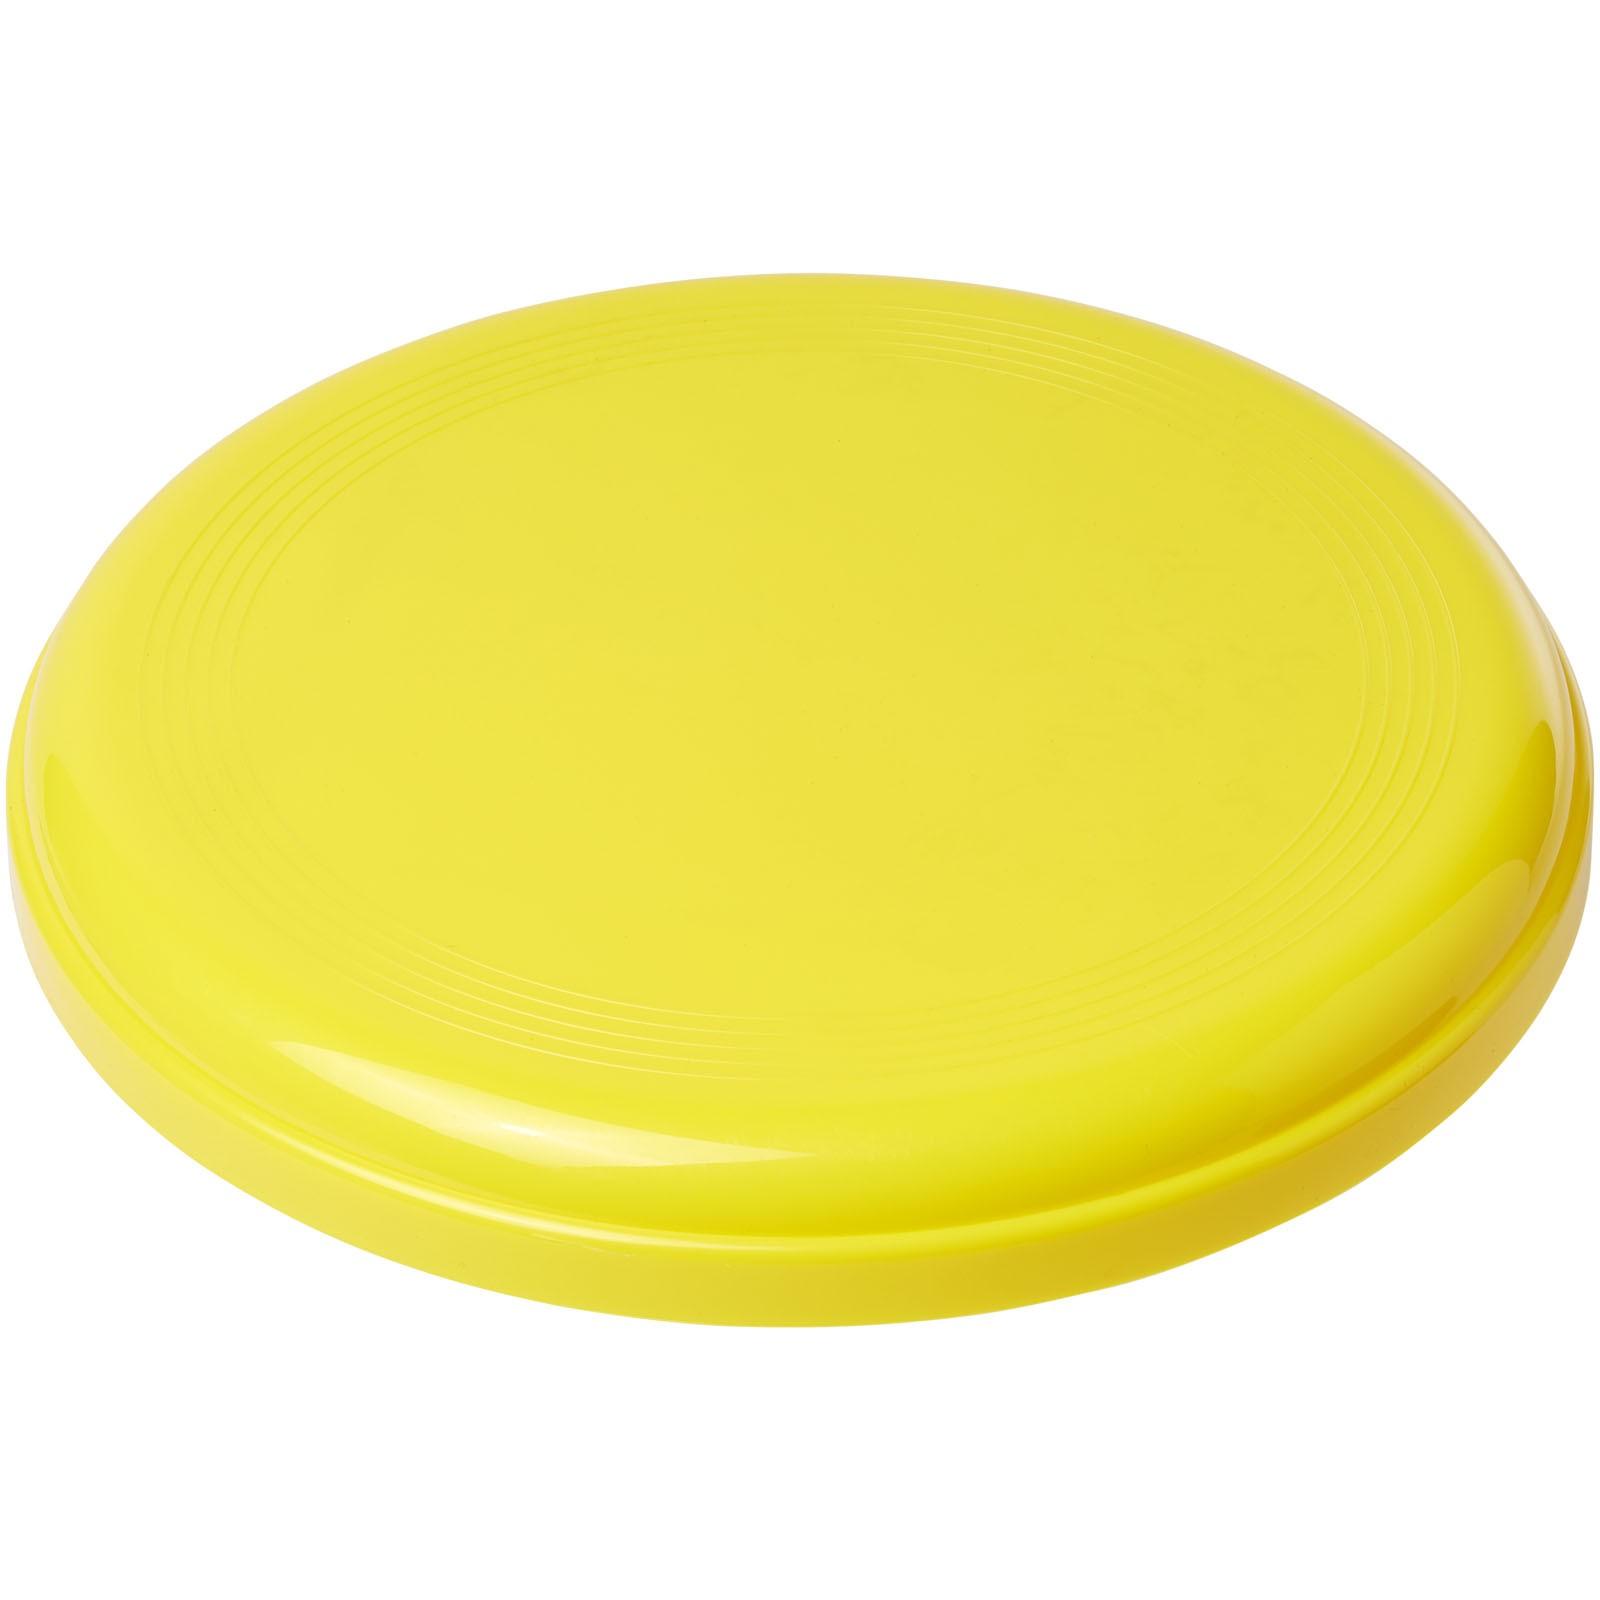 Cruz medium plastic frisbee - Yellow